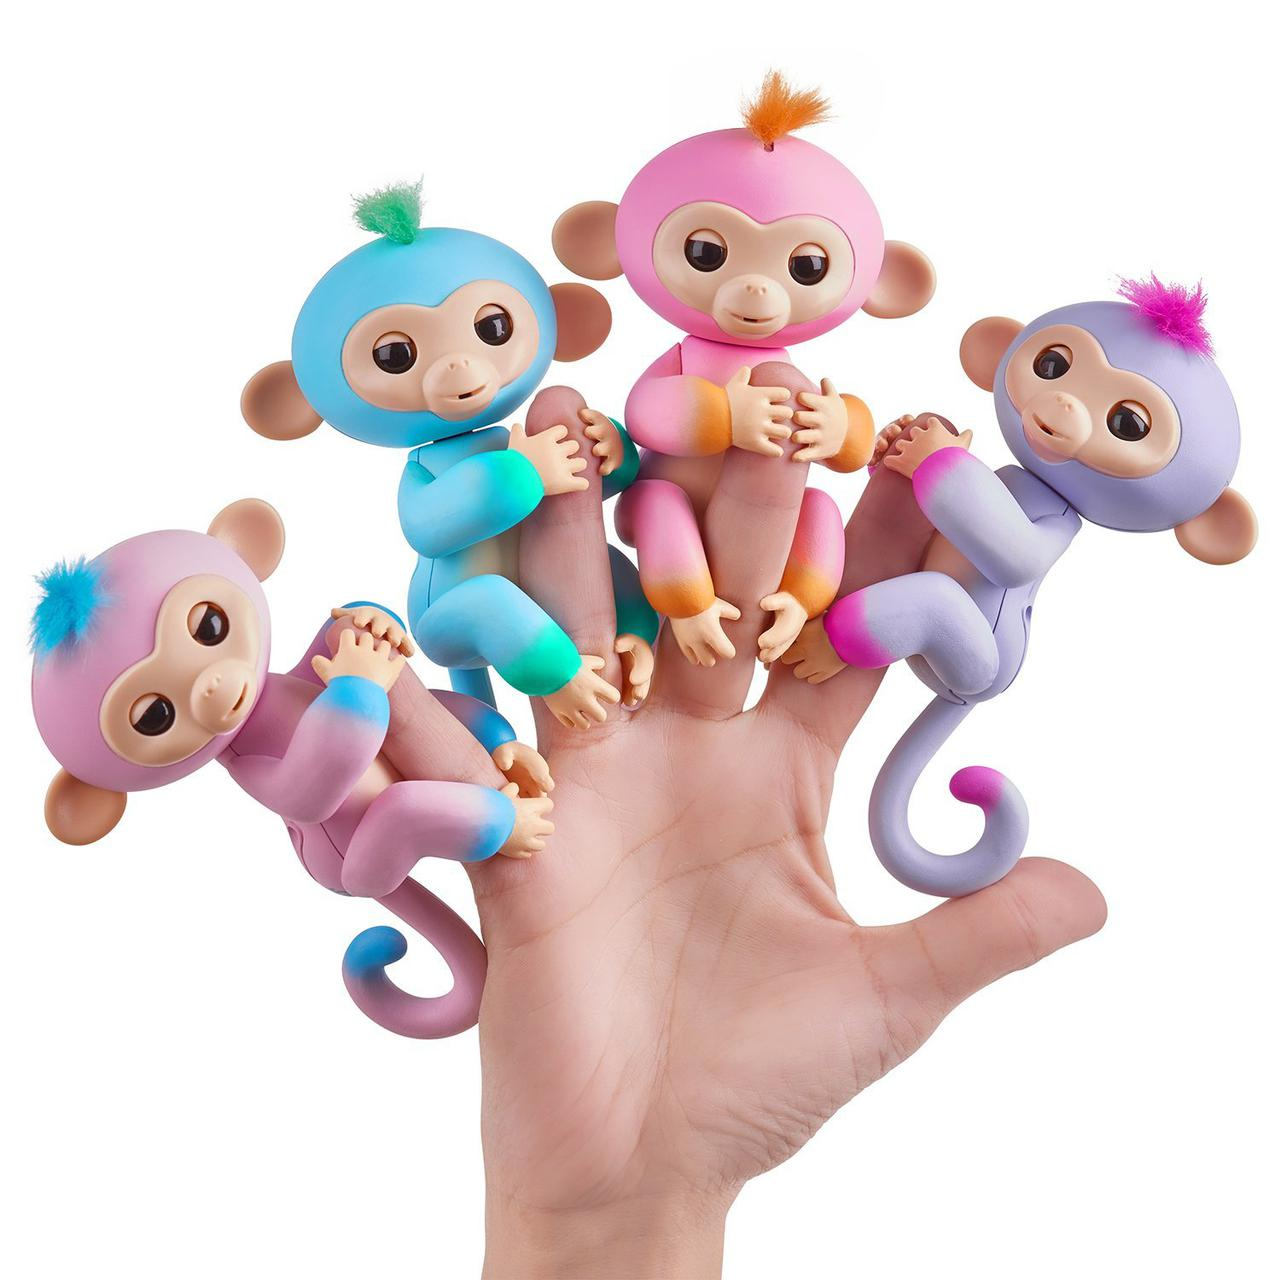 Интерактивная обезьянка двухцветная, WowWee Fingerlings Monkey, оригинал из США